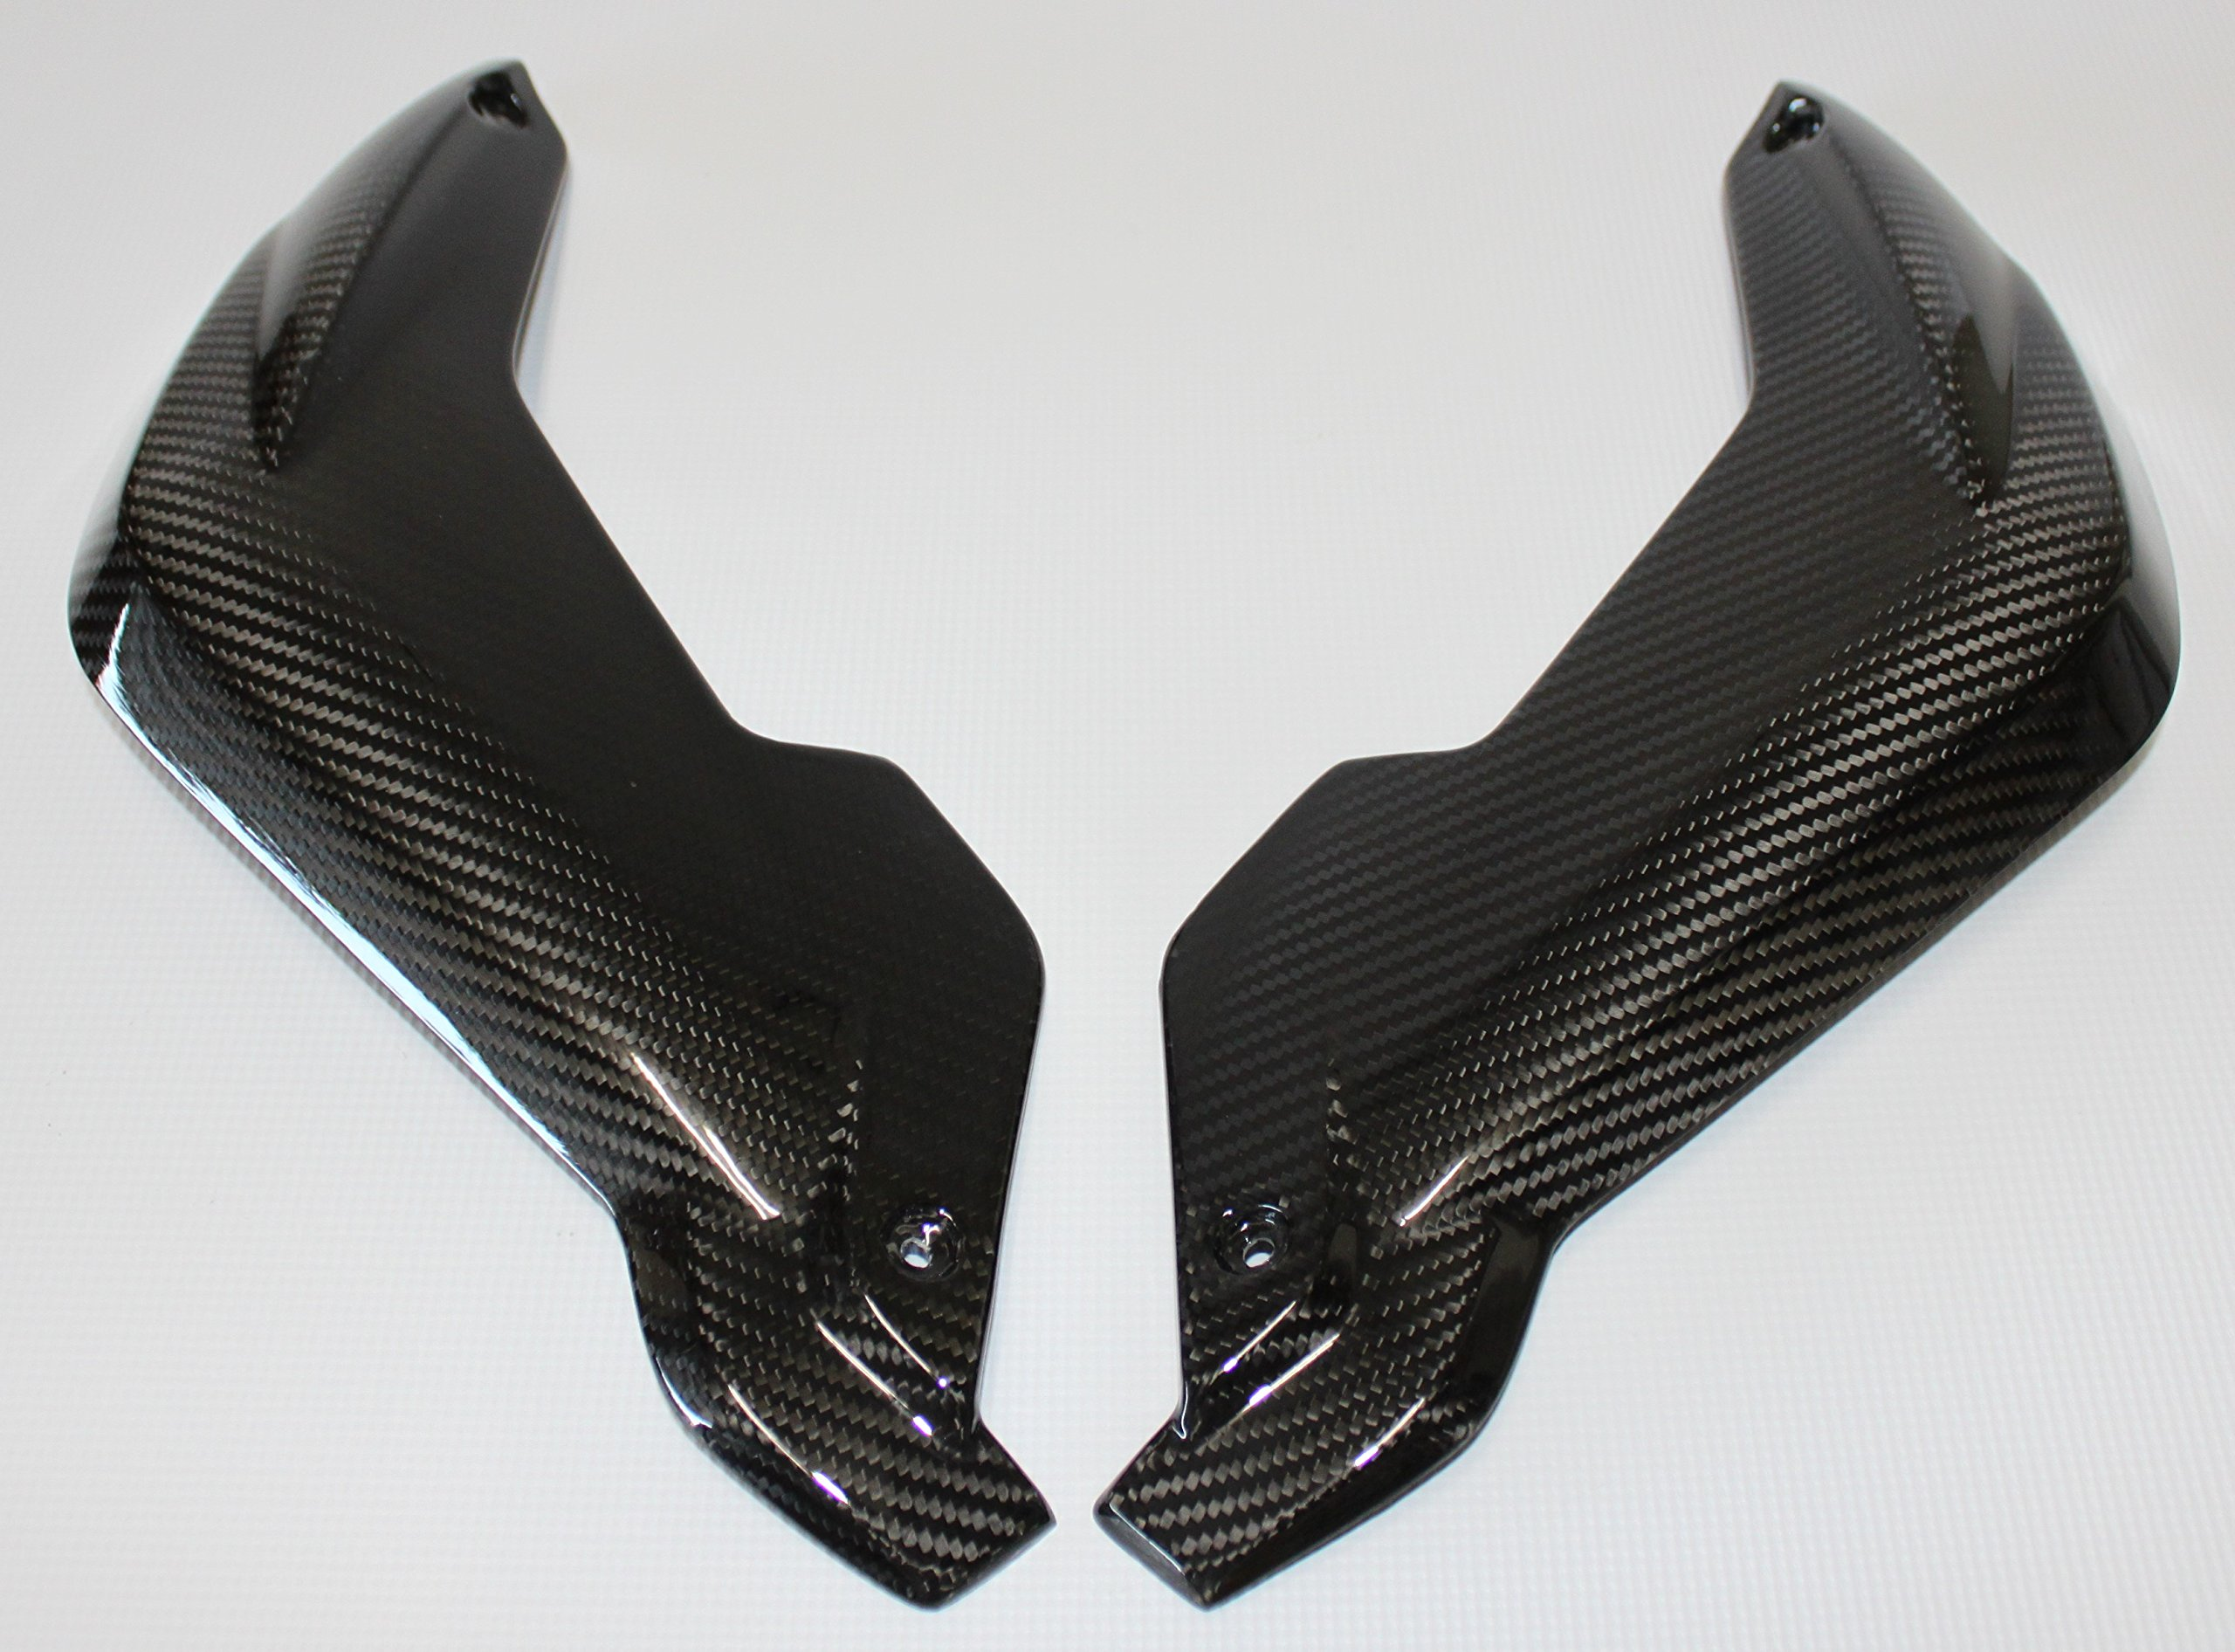 Carbon Fiber Racing, BKBM34CFFG, Carbon Fiber / Fiberglass BMW K1300R 2009-2015 Fork Covers